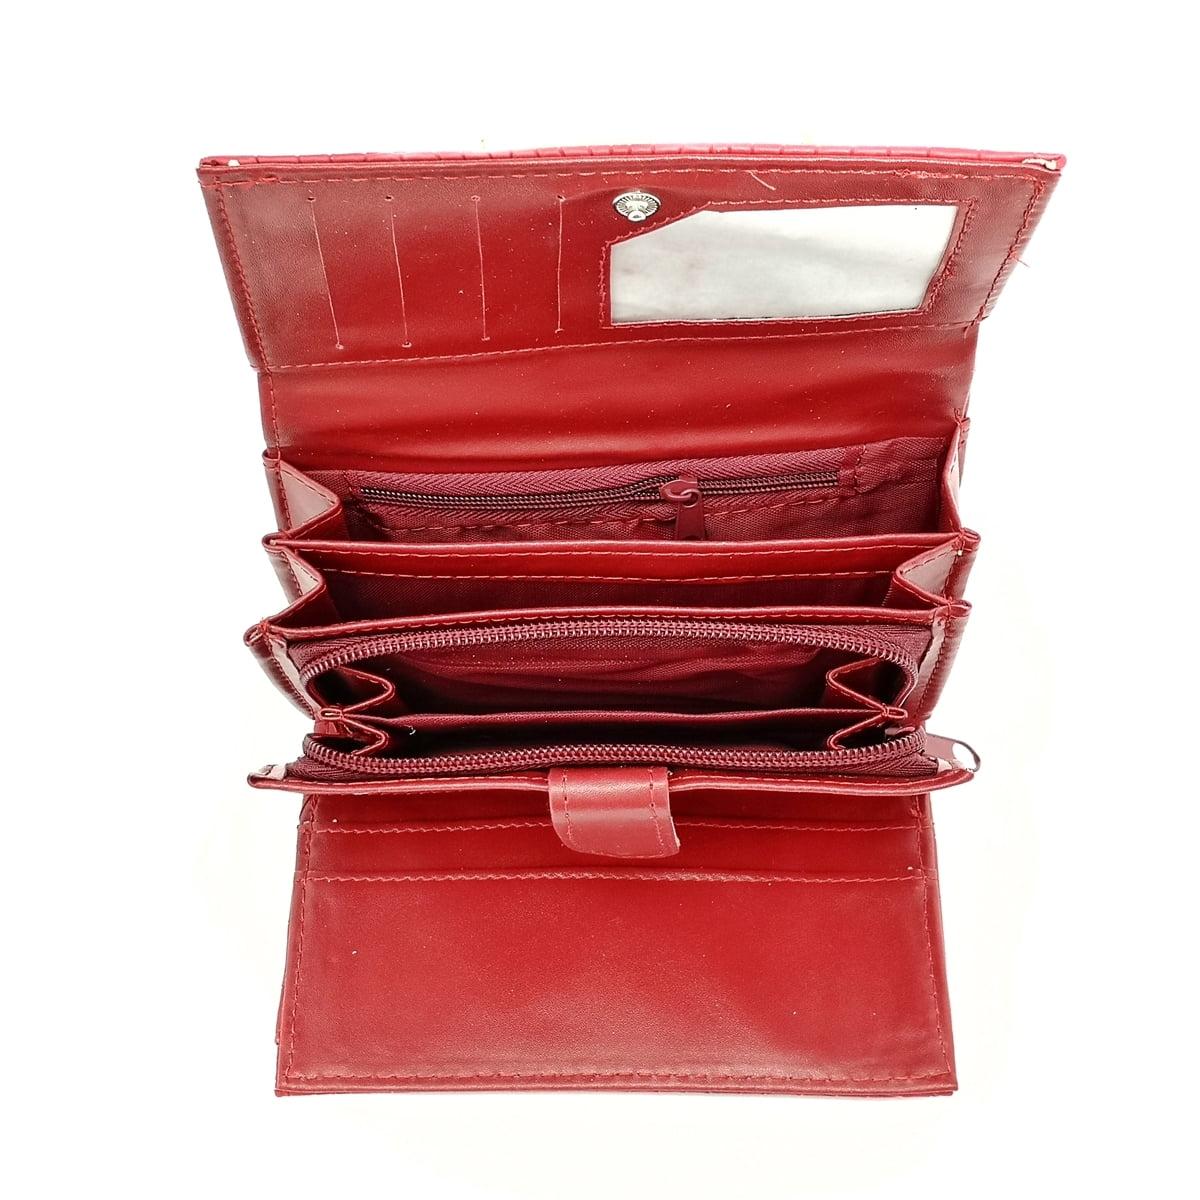 Portofel dama, lacuit, visiniu, buzunar mare lateral,,din material sintetic,15/10 cm, Magrot 4014